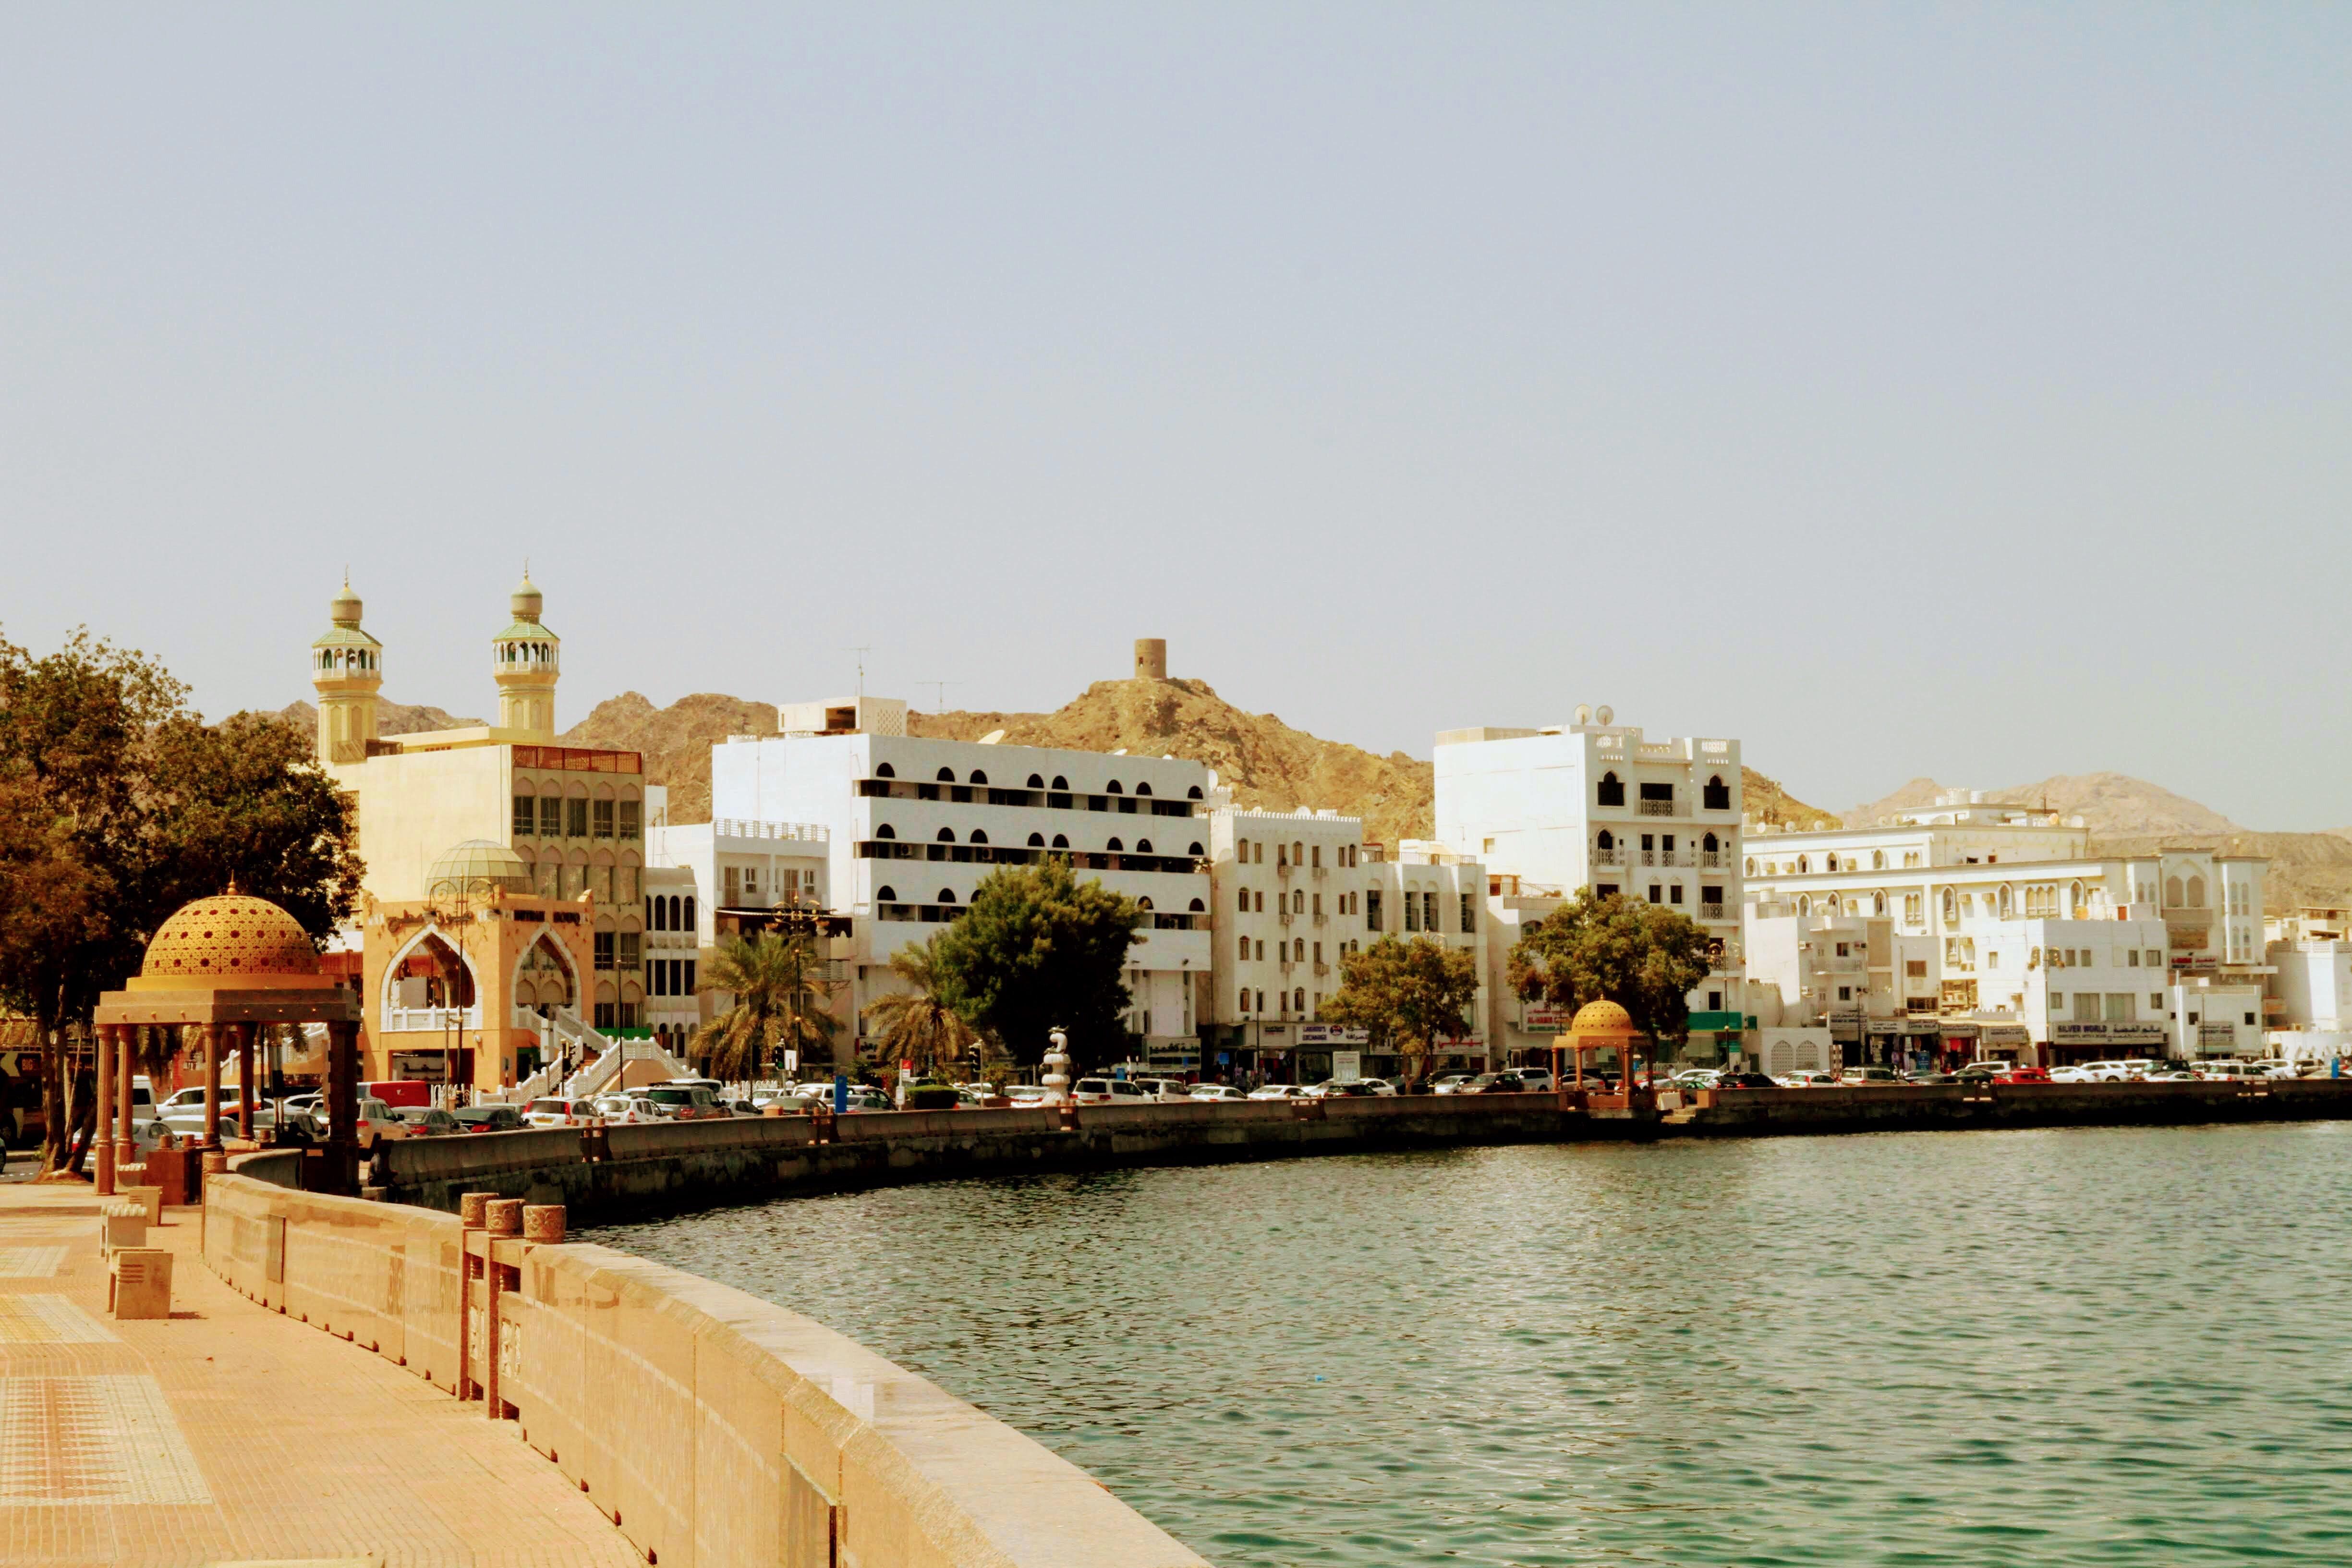 Port of Muttrah, Muscat, Oman